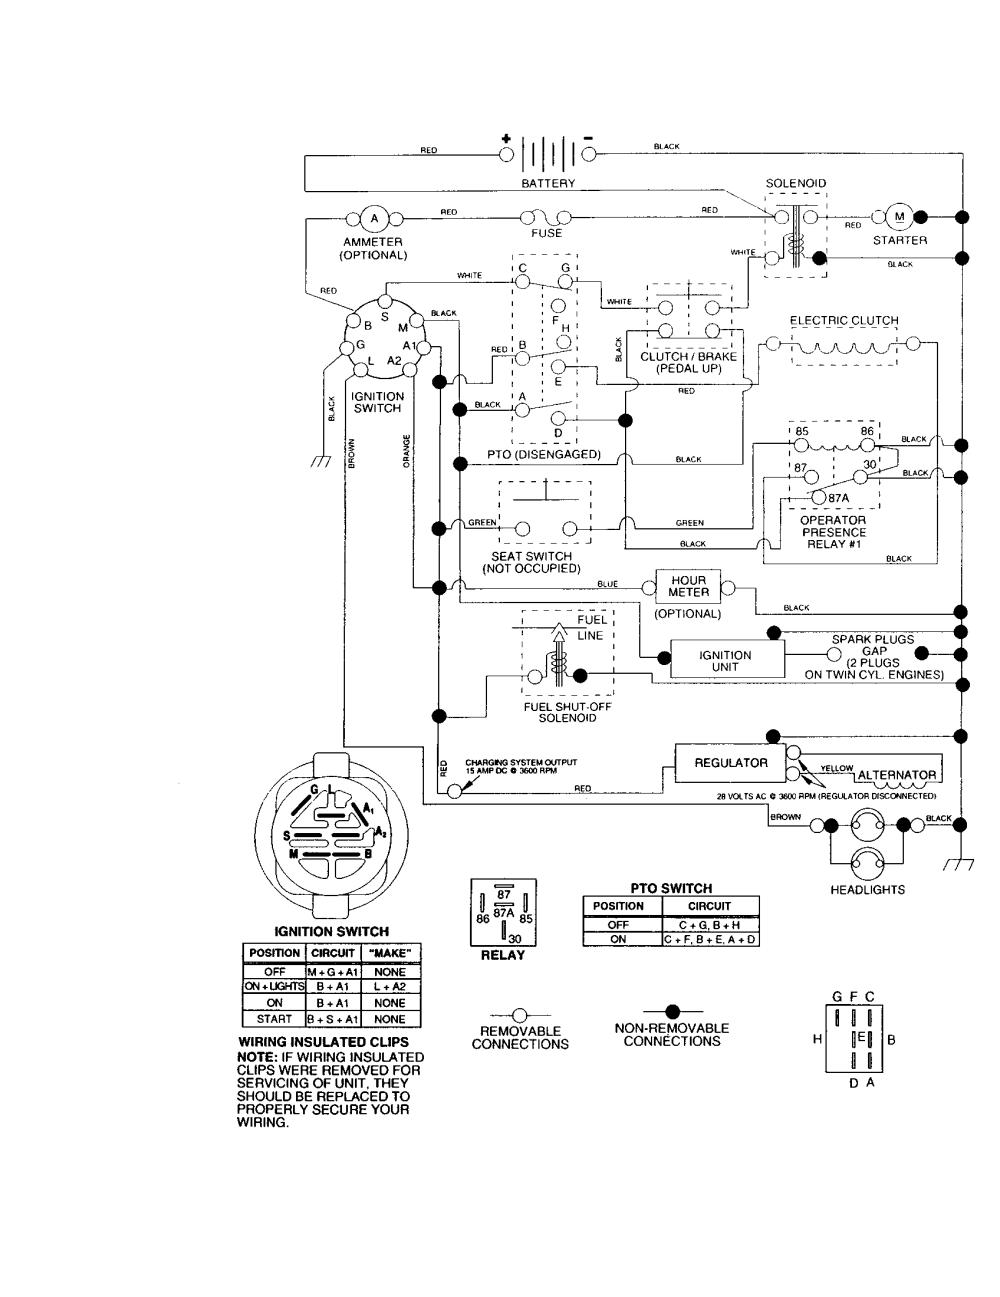 medium resolution of craftsman lt1000 wiring craftsman free engine image for user manual